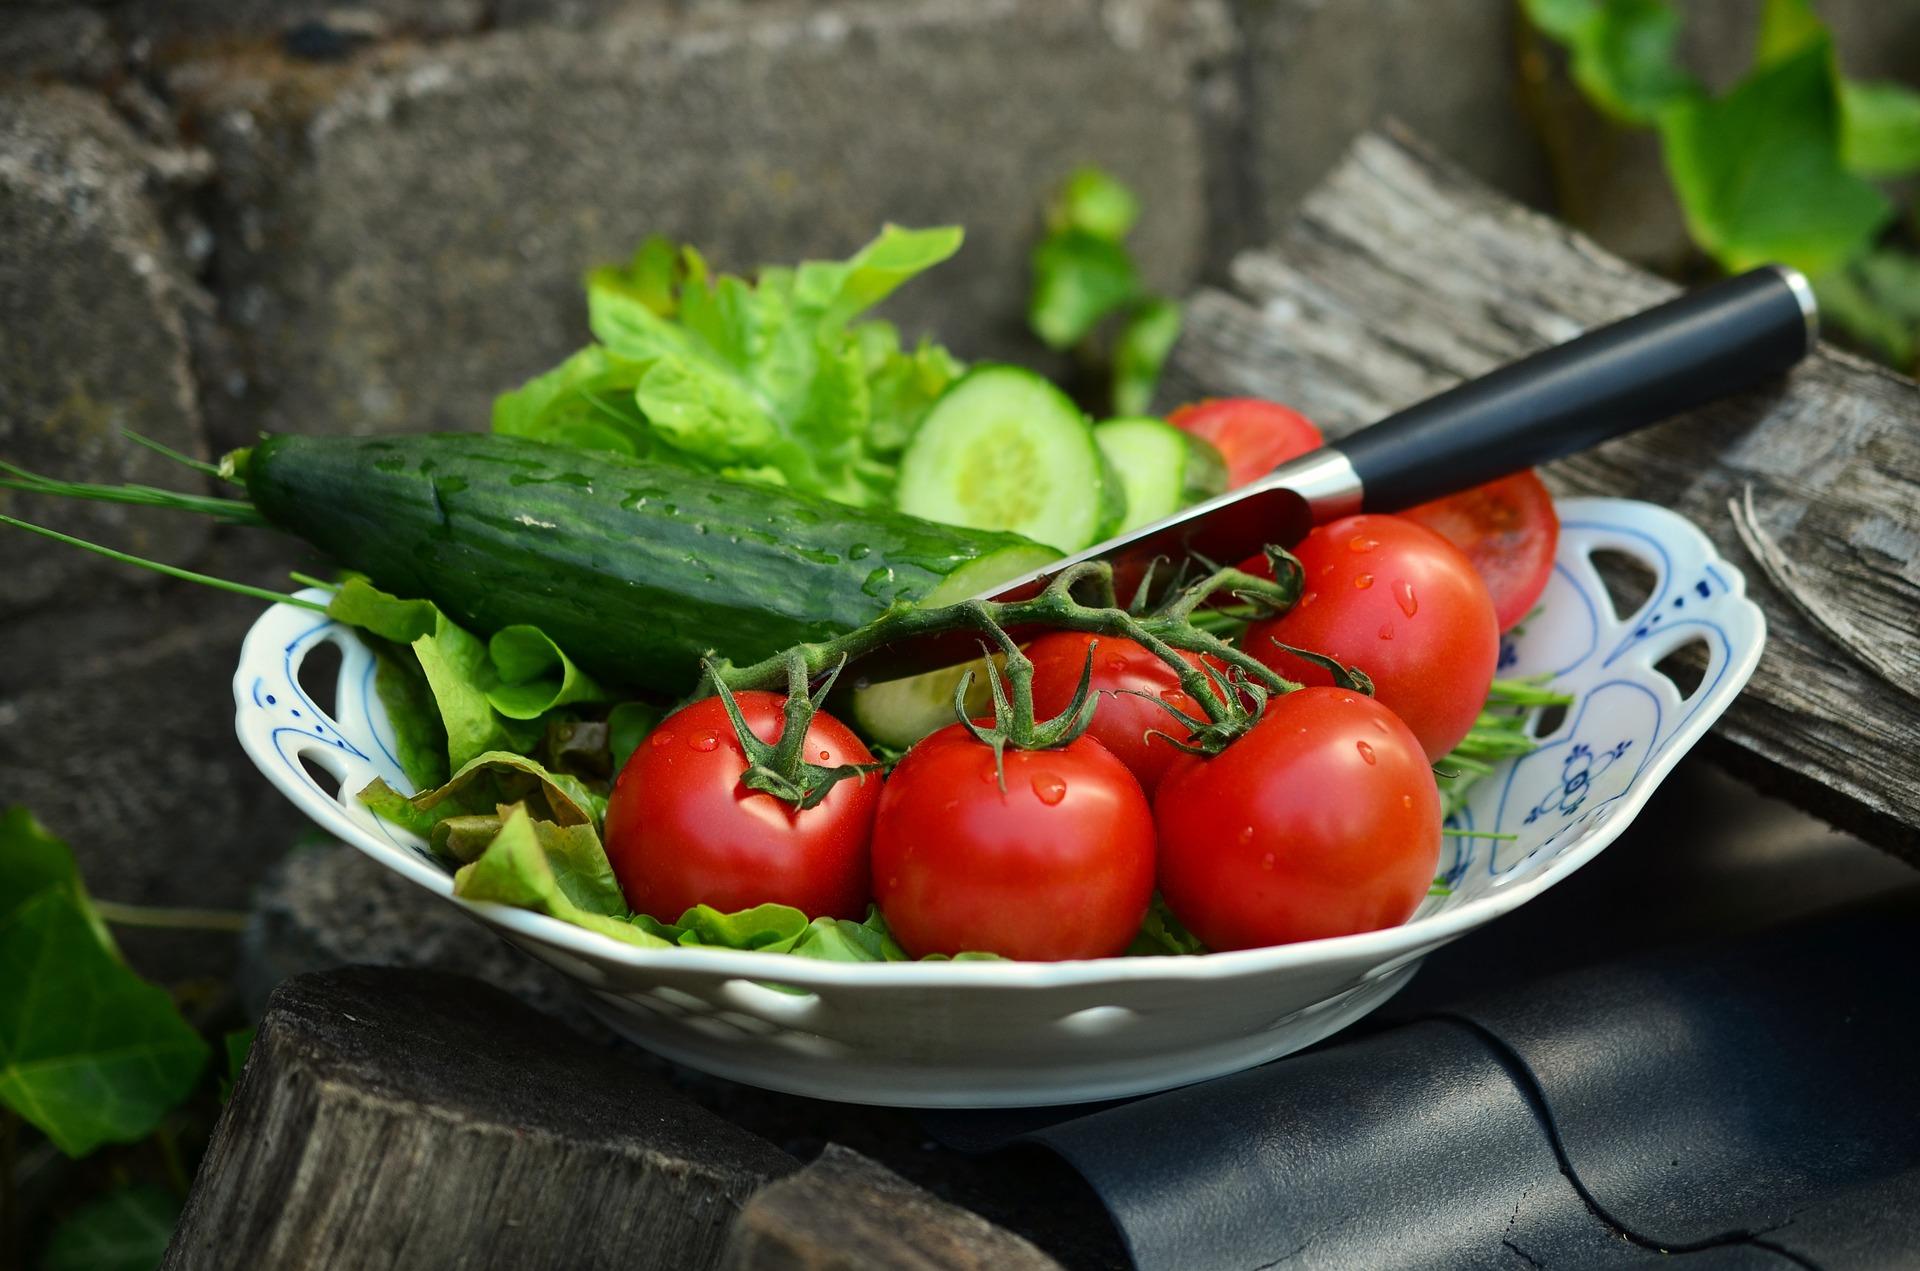 tomatoes-836332_1920.jpg